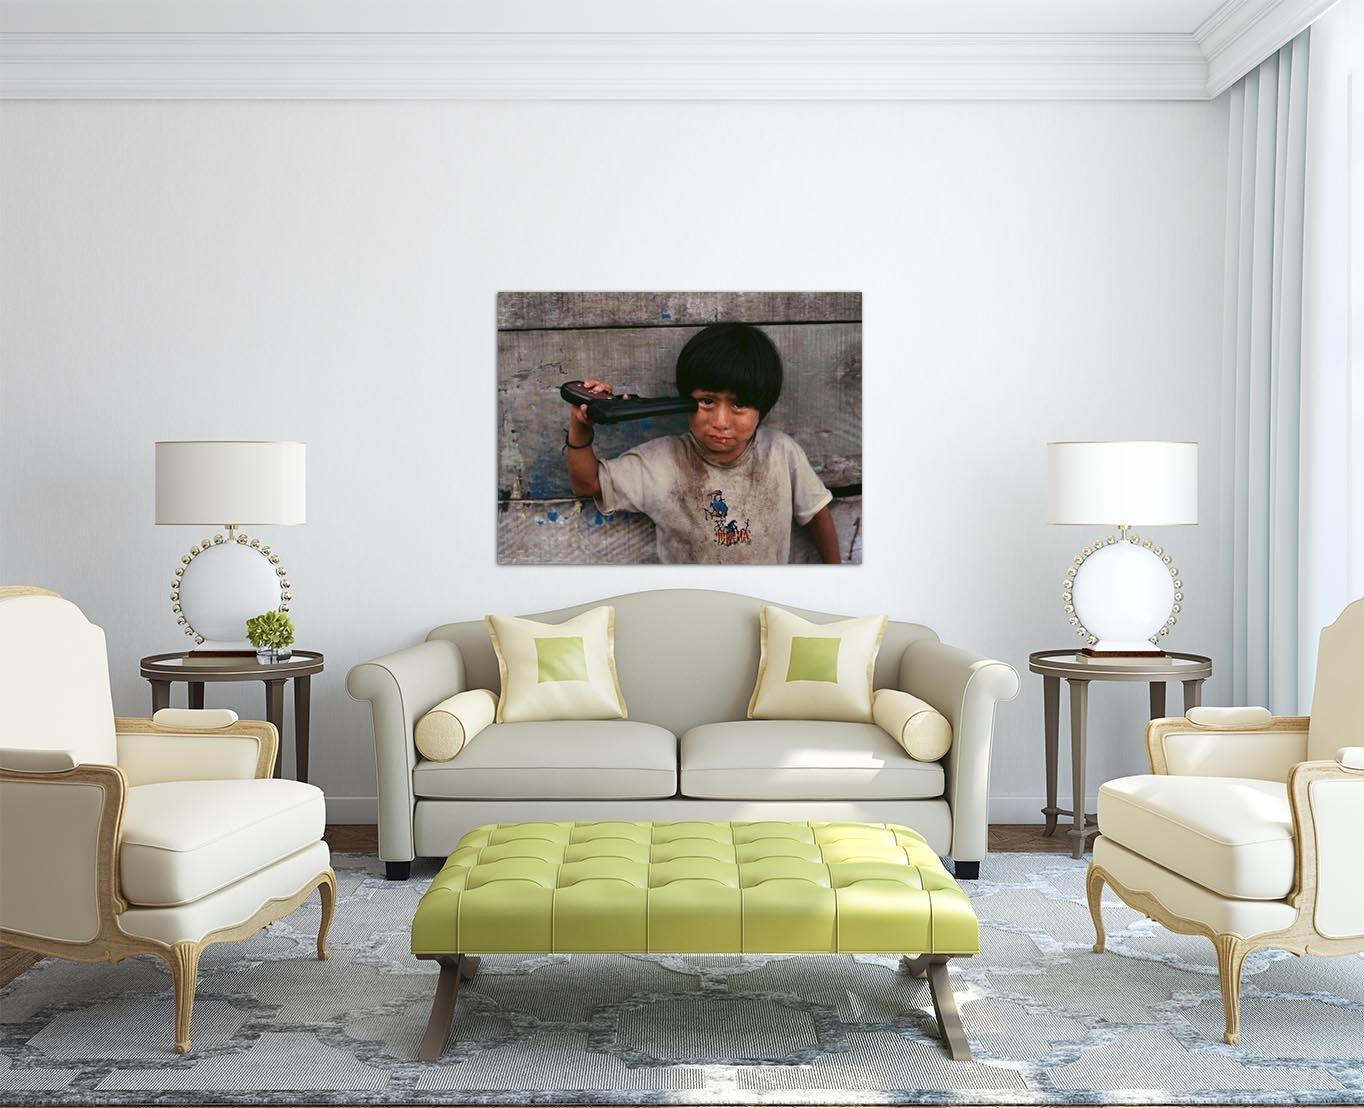 Amazon.de: Steve McCurry - Peru Rahmen MDF-Rand schwarz 100 x 75 cm